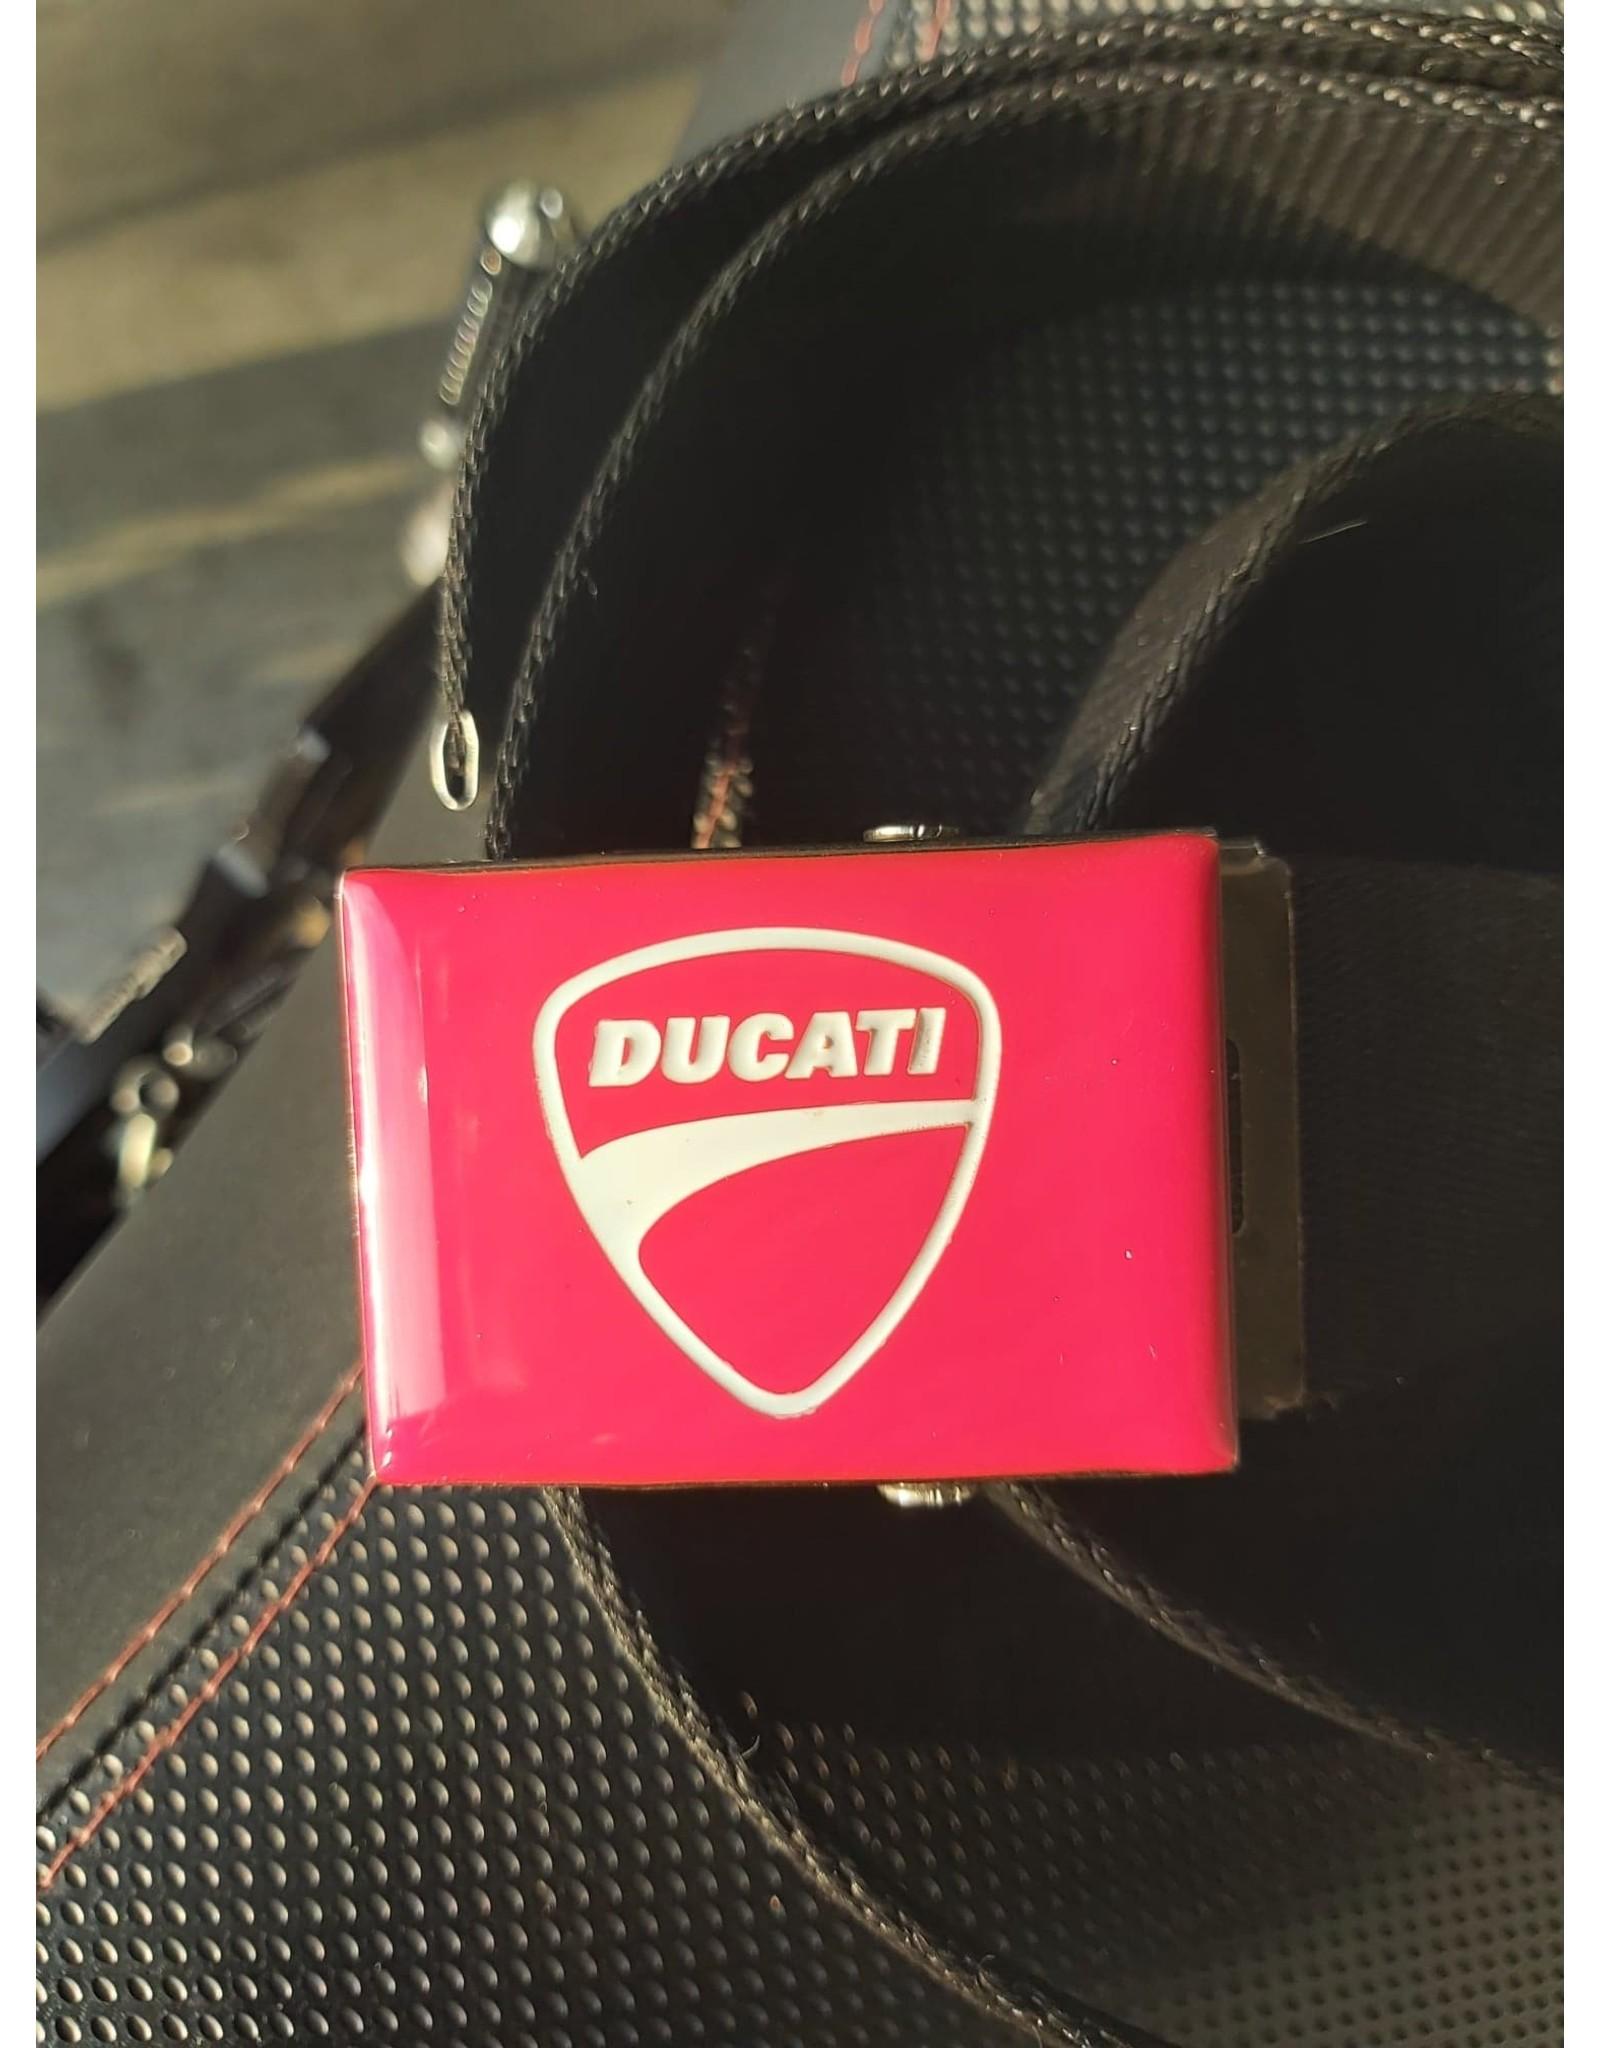 Ducati Ducati Broeksriem